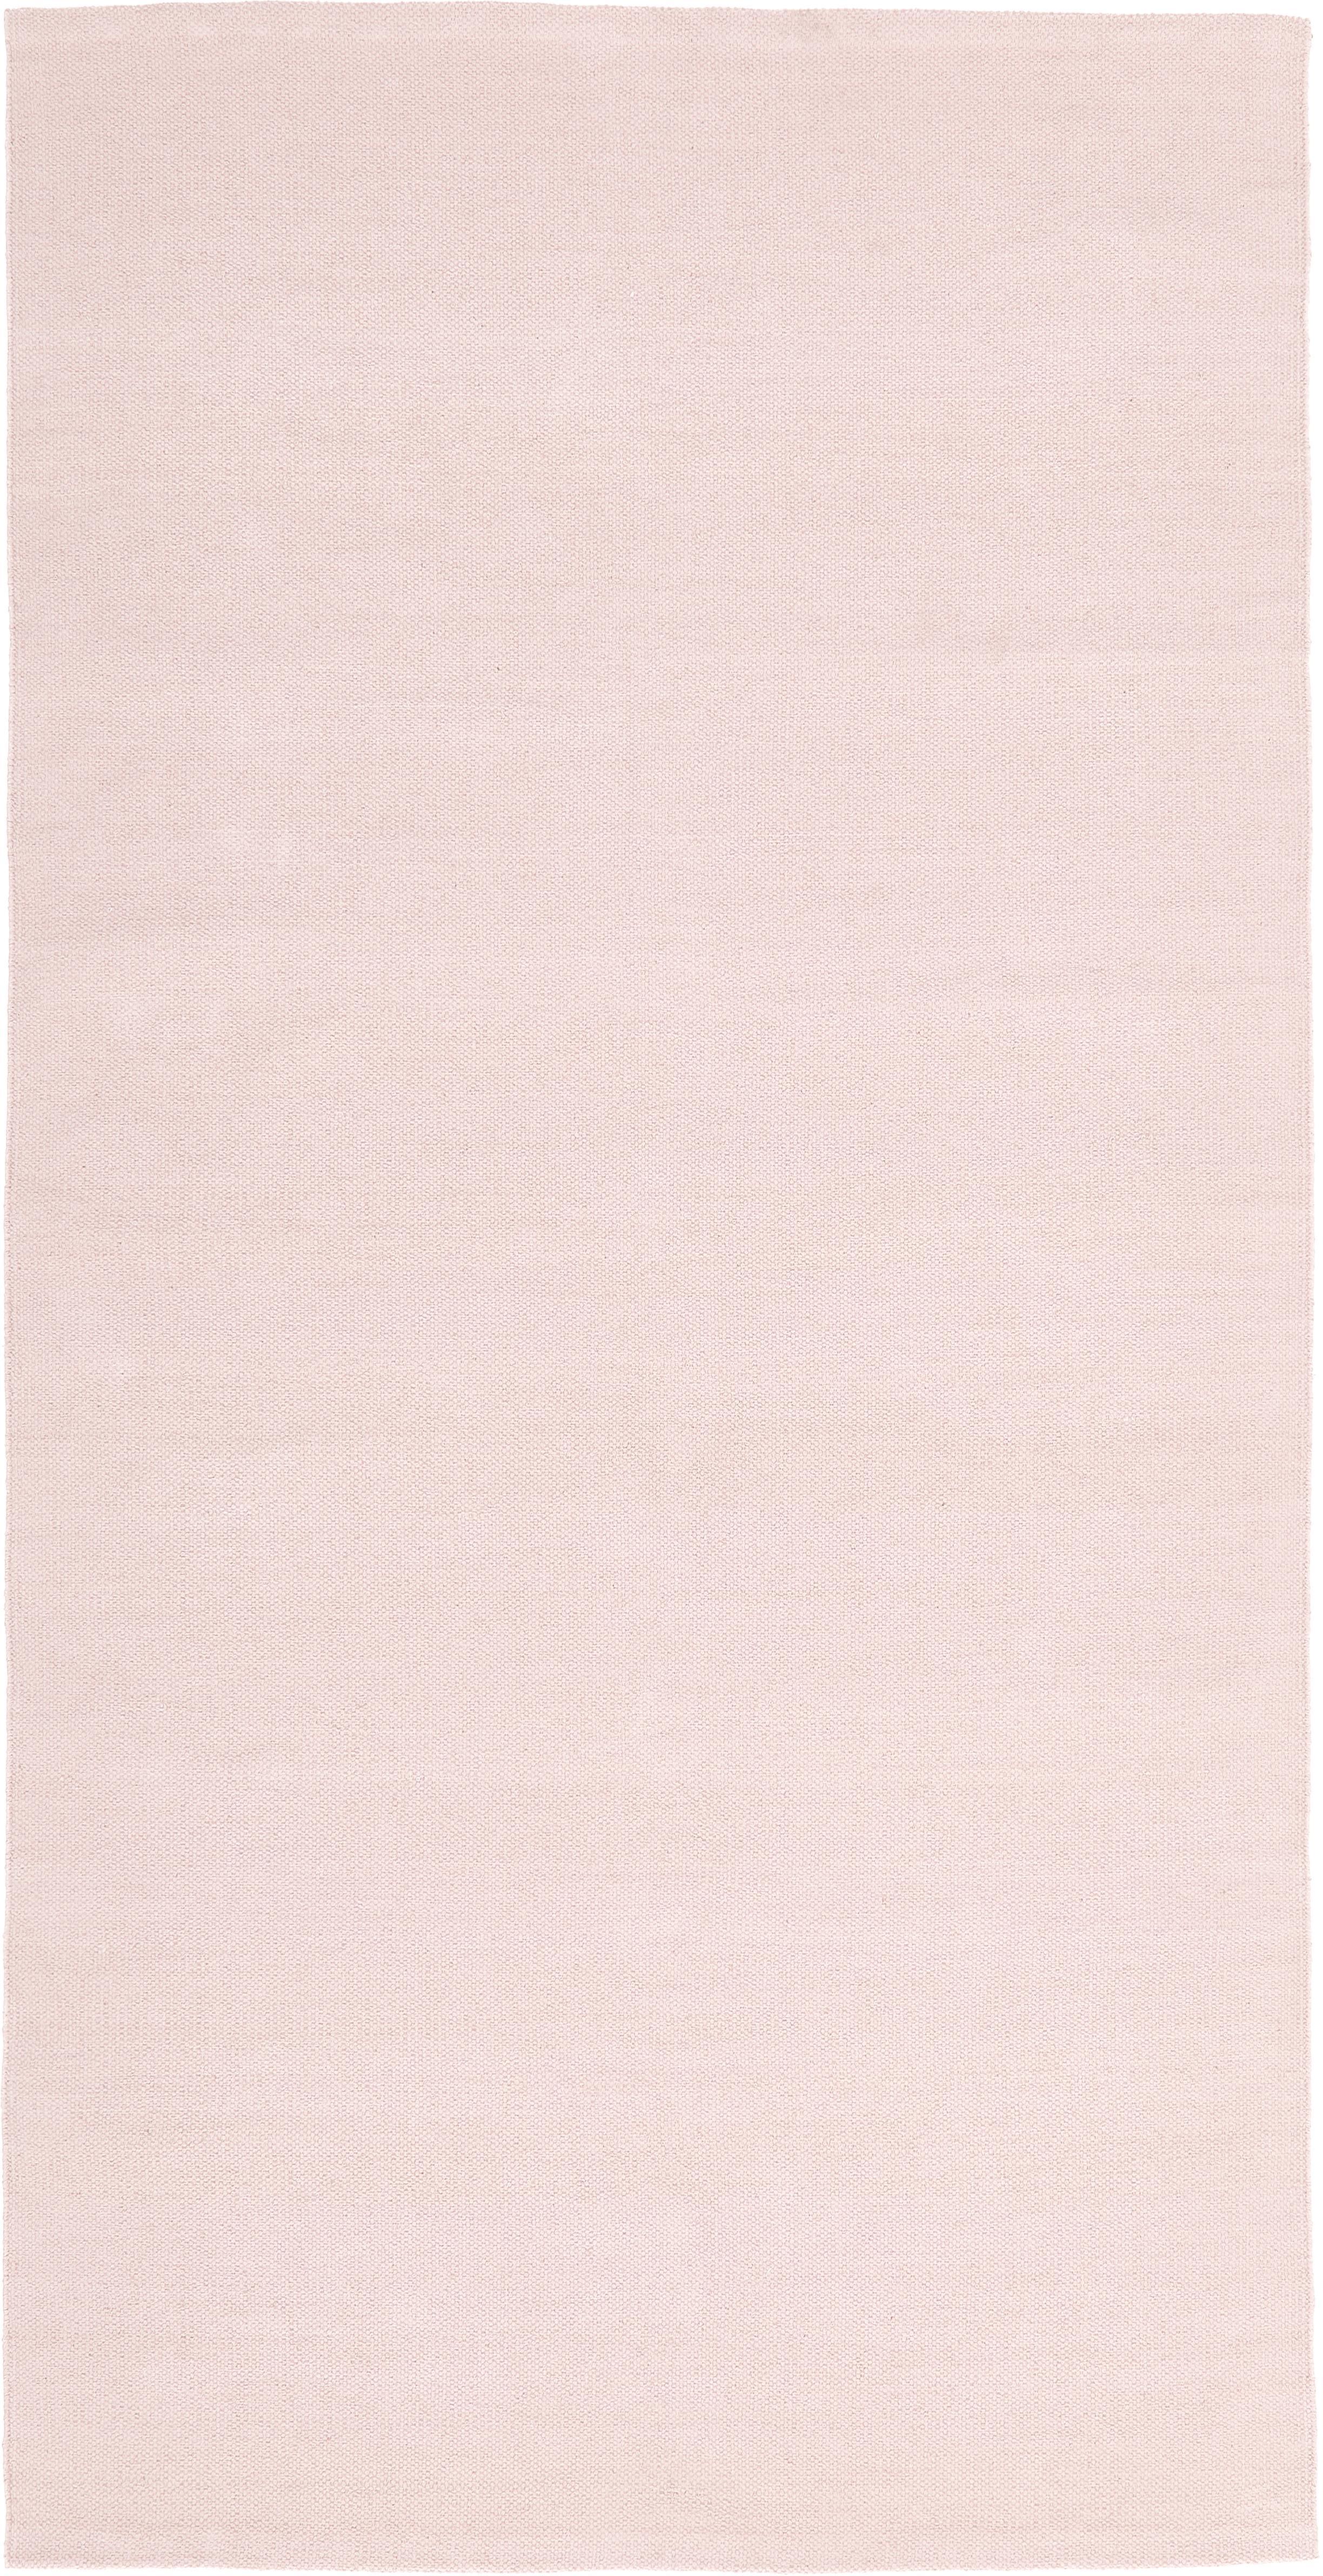 Dünner Baumwollteppich Agneta, handgewebt, 100% Baumwolle, Rosa, B 70 x L 140 cm (Größe XS)